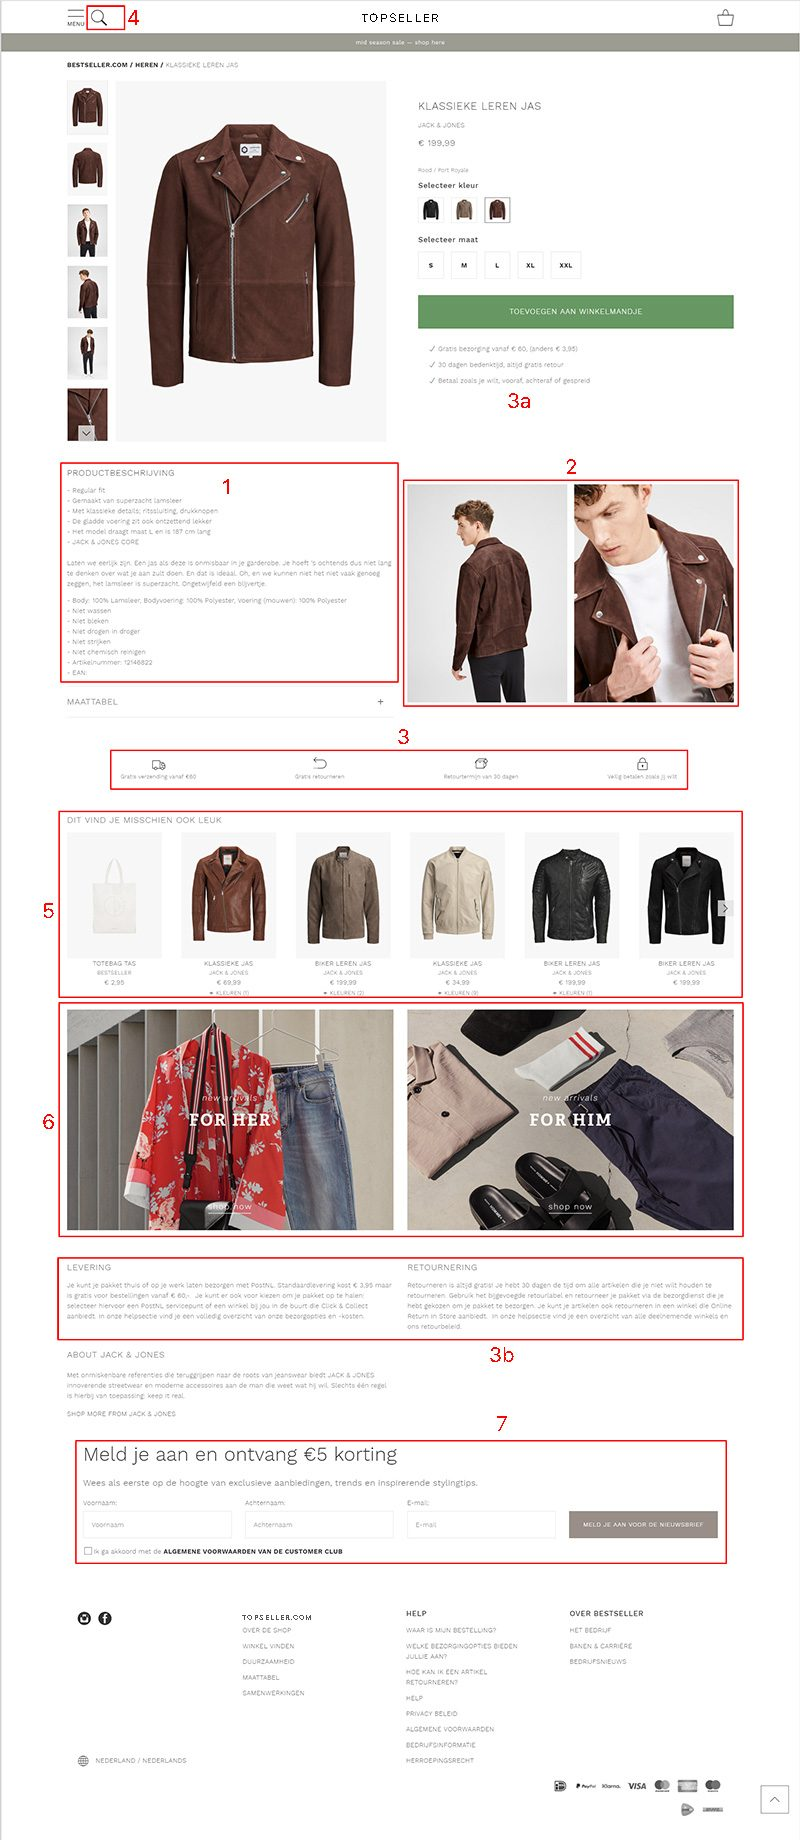 Topseller.com PDP Original